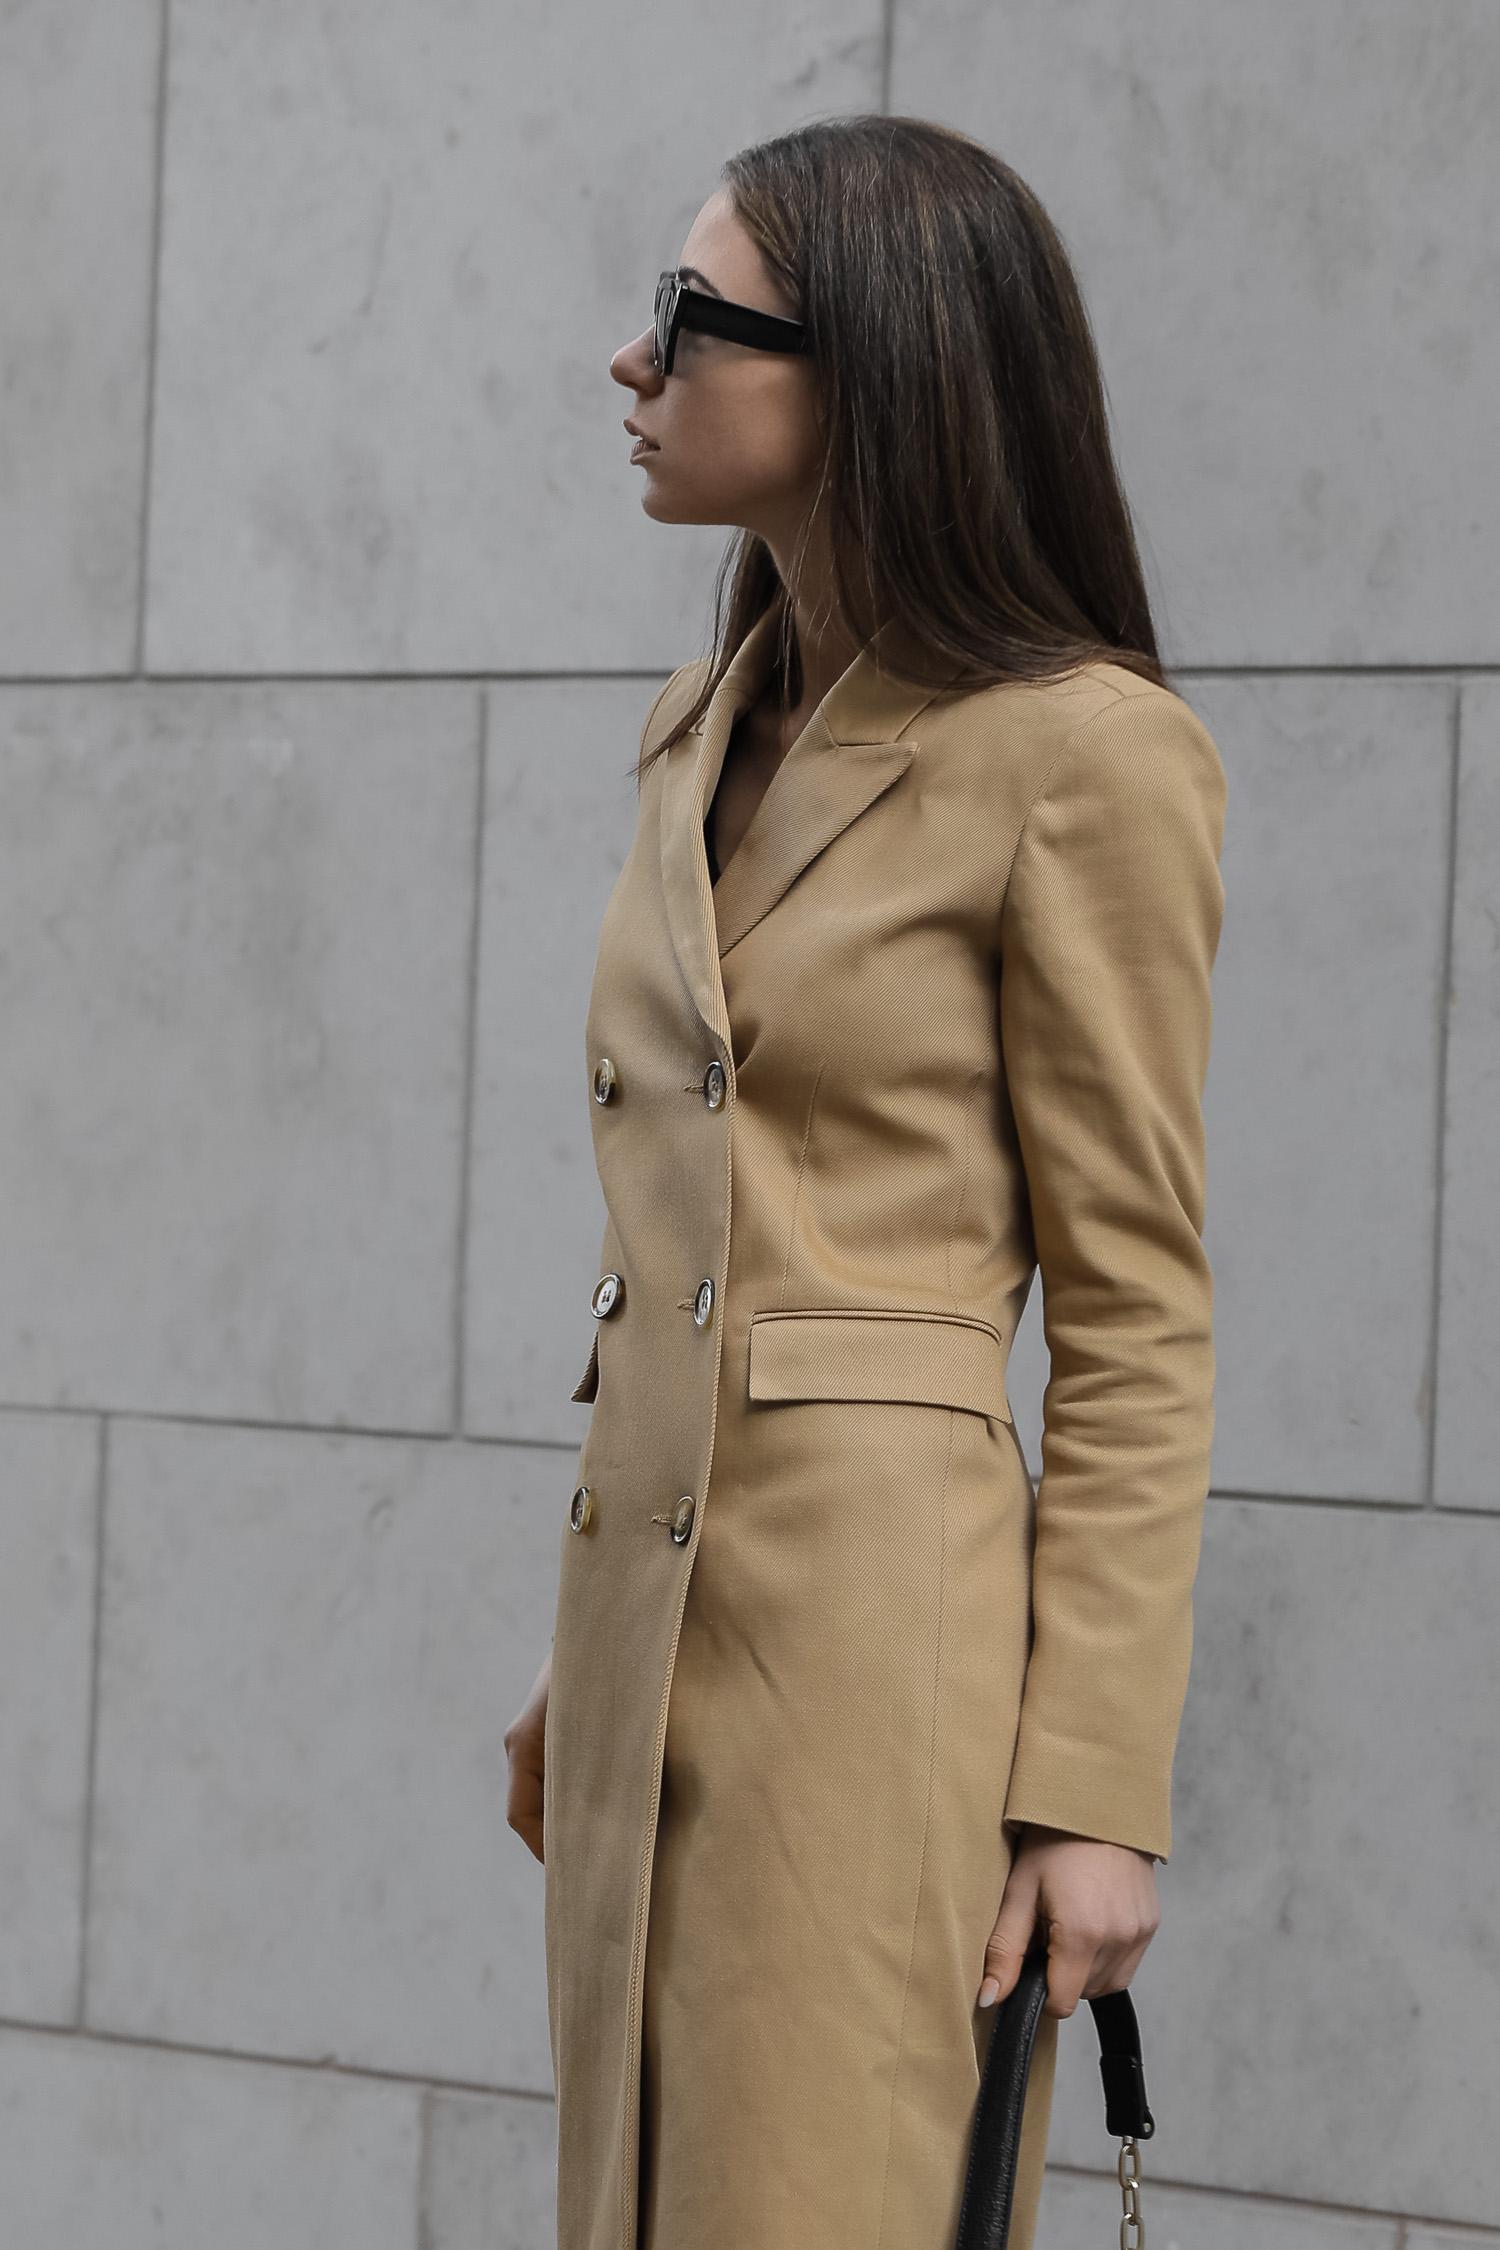 asmin-kessler-modeblogger-2020-streetstyle-ivy-oak-mantel-zalandostyle-